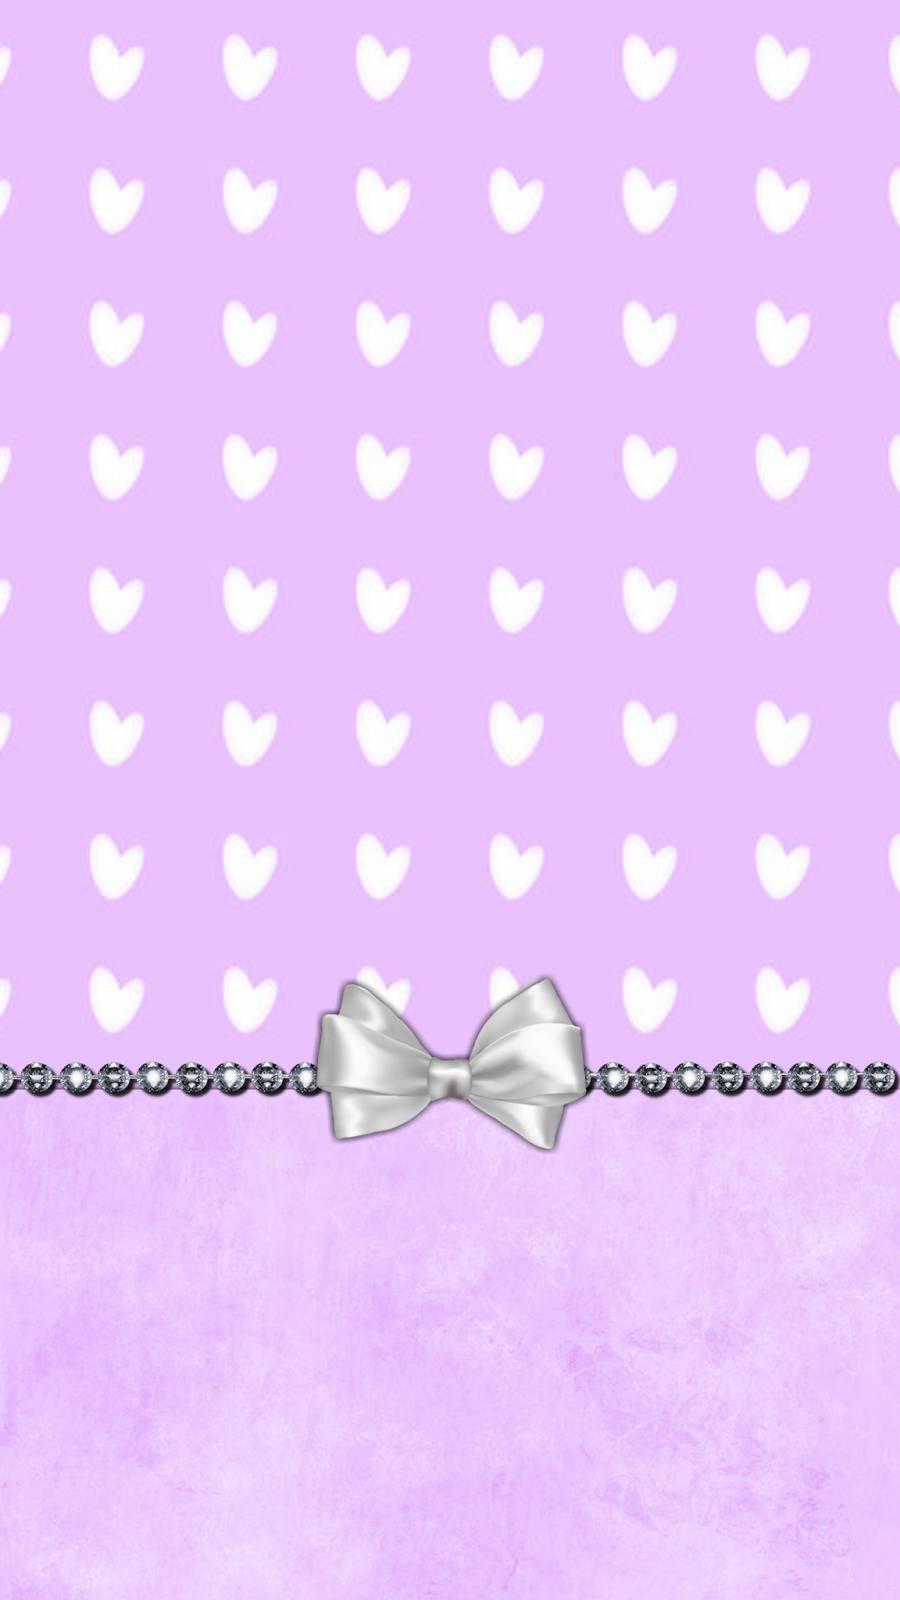 Good Wallpaper Hello Kitty Ribbon - f46b573abc54d7990467aa82c53dfc5f  Picture_535259.png